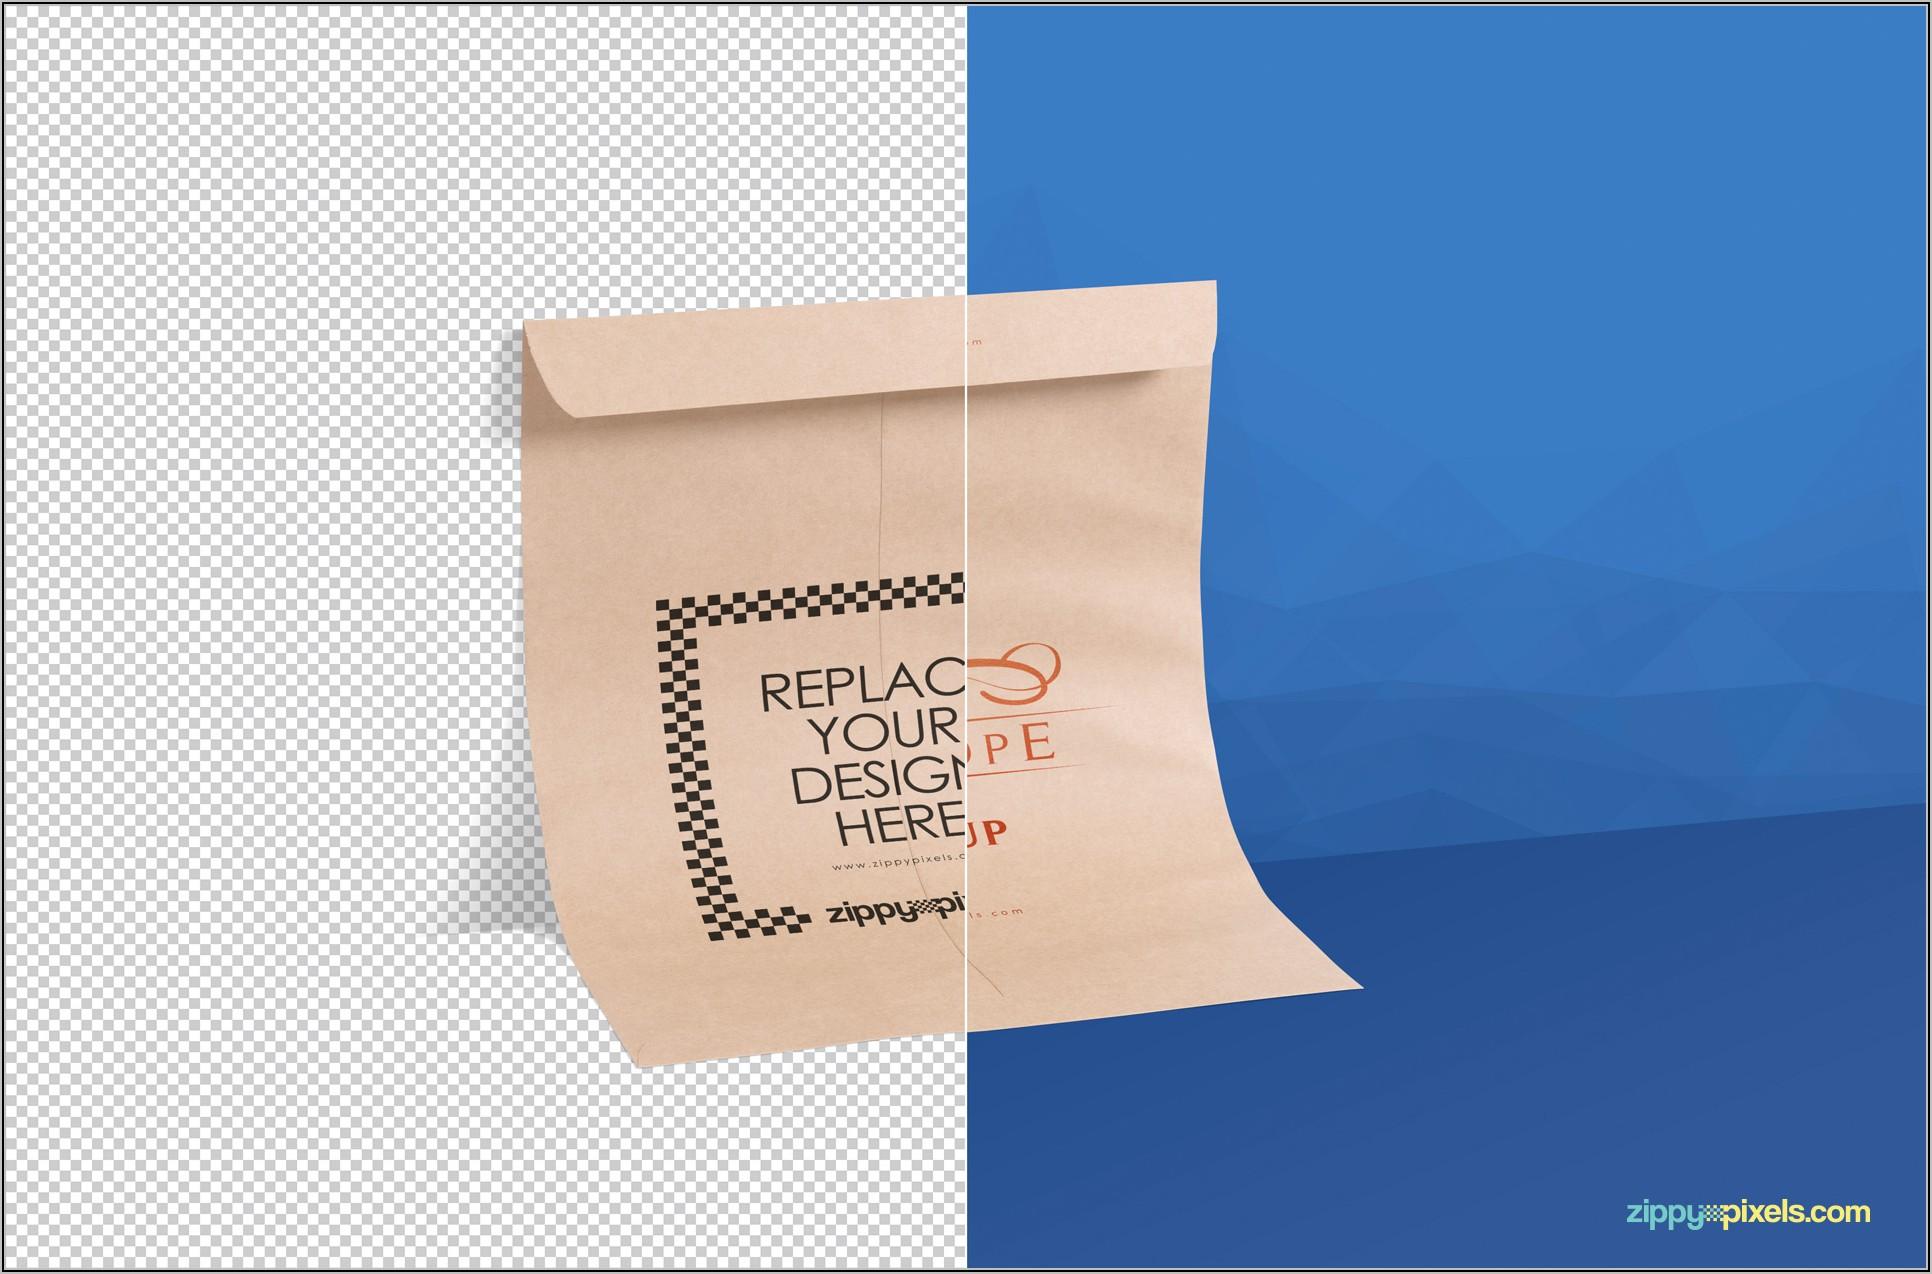 C4 Envelope Mockup Psd Free Download